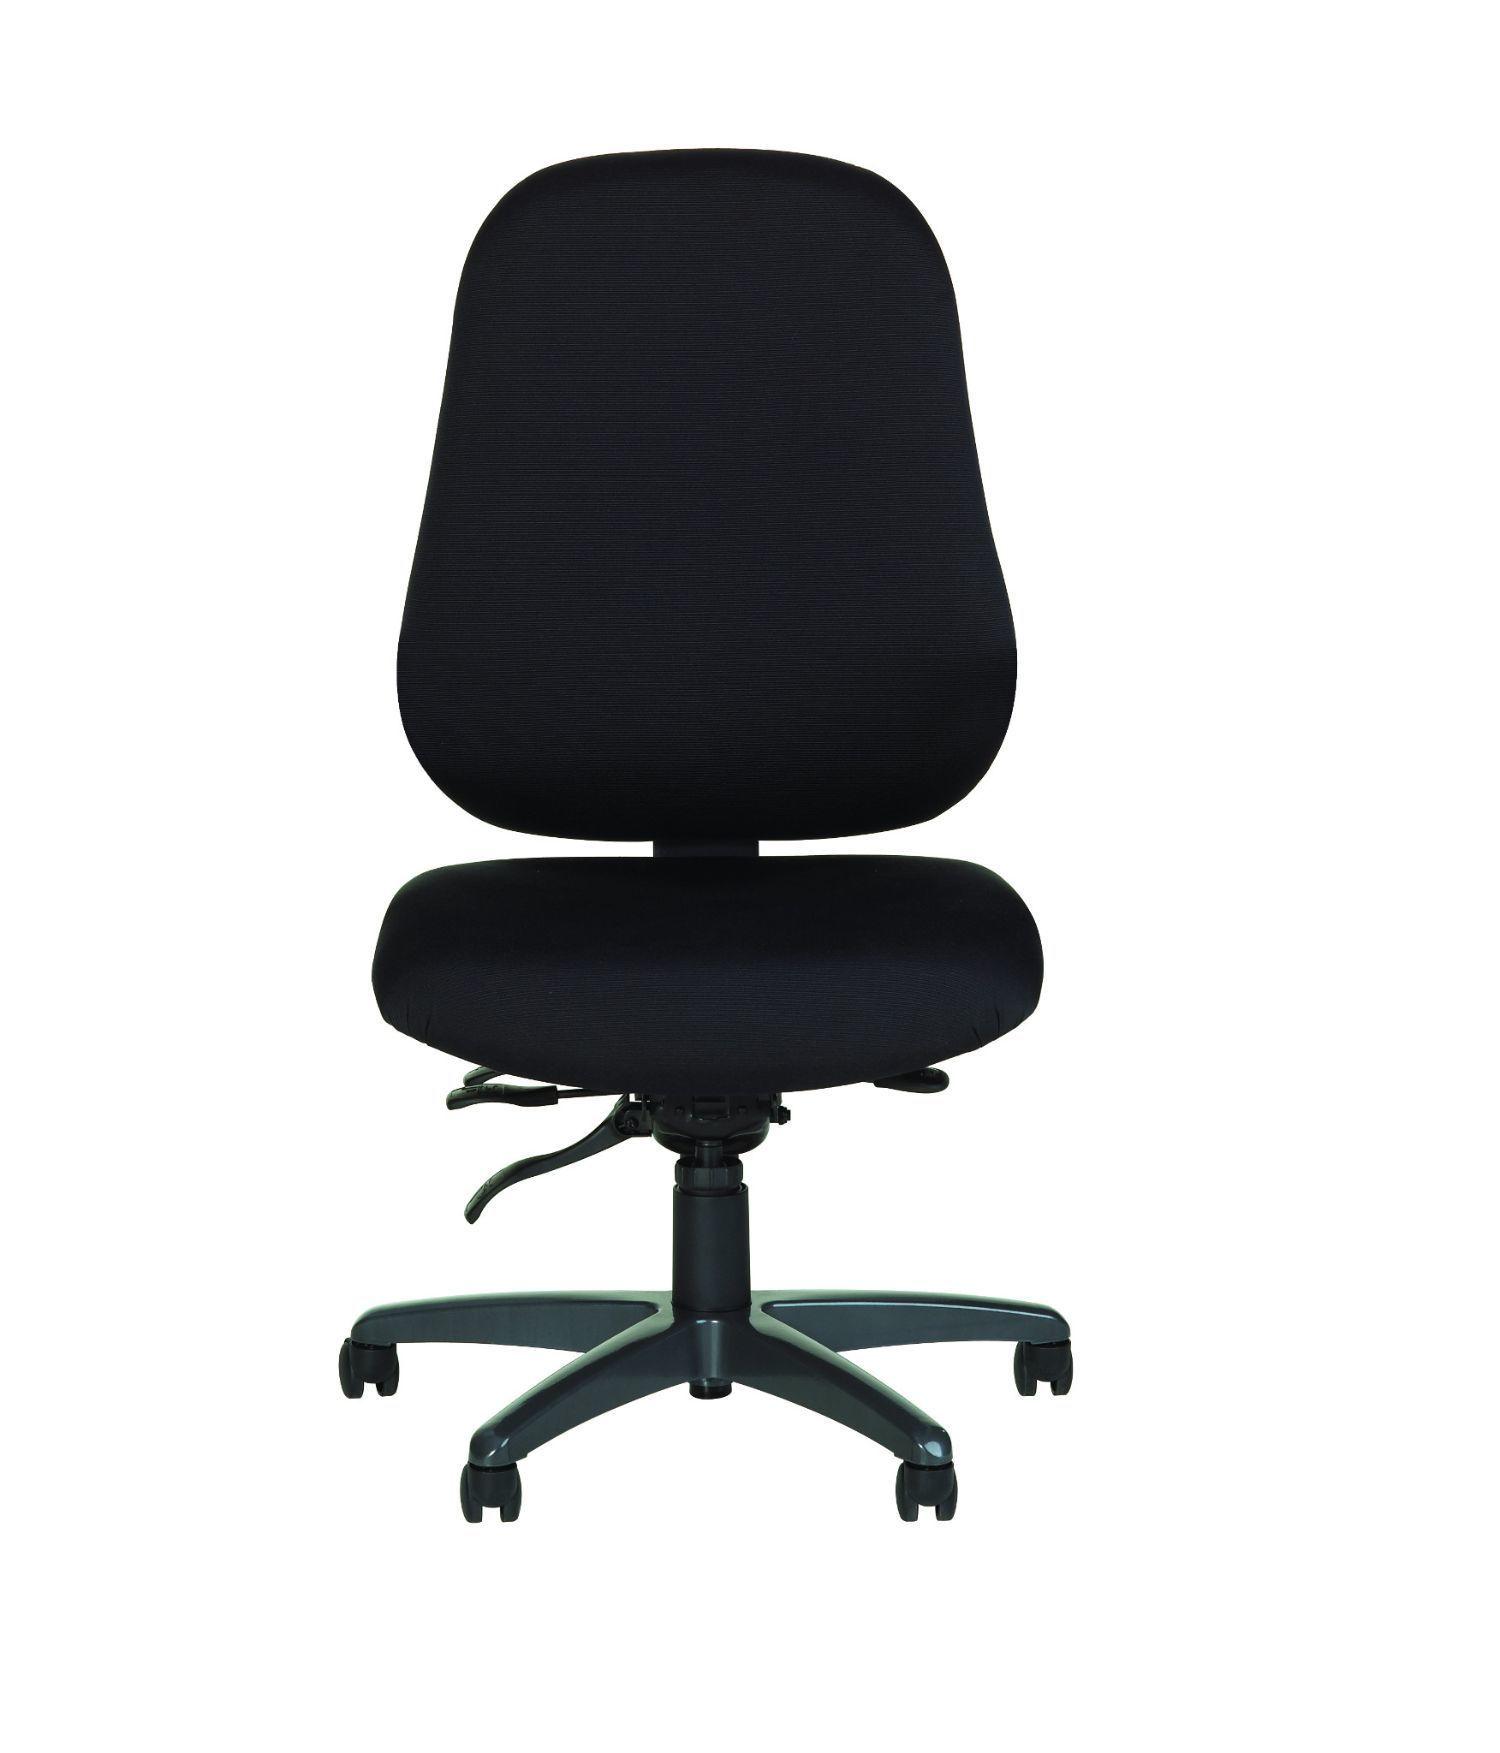 Ki Pilot Armless Heavy Duty Big And Tall Chair Office Chair Tall Office Chairs Leather Office Chair Tall office chairs with arms